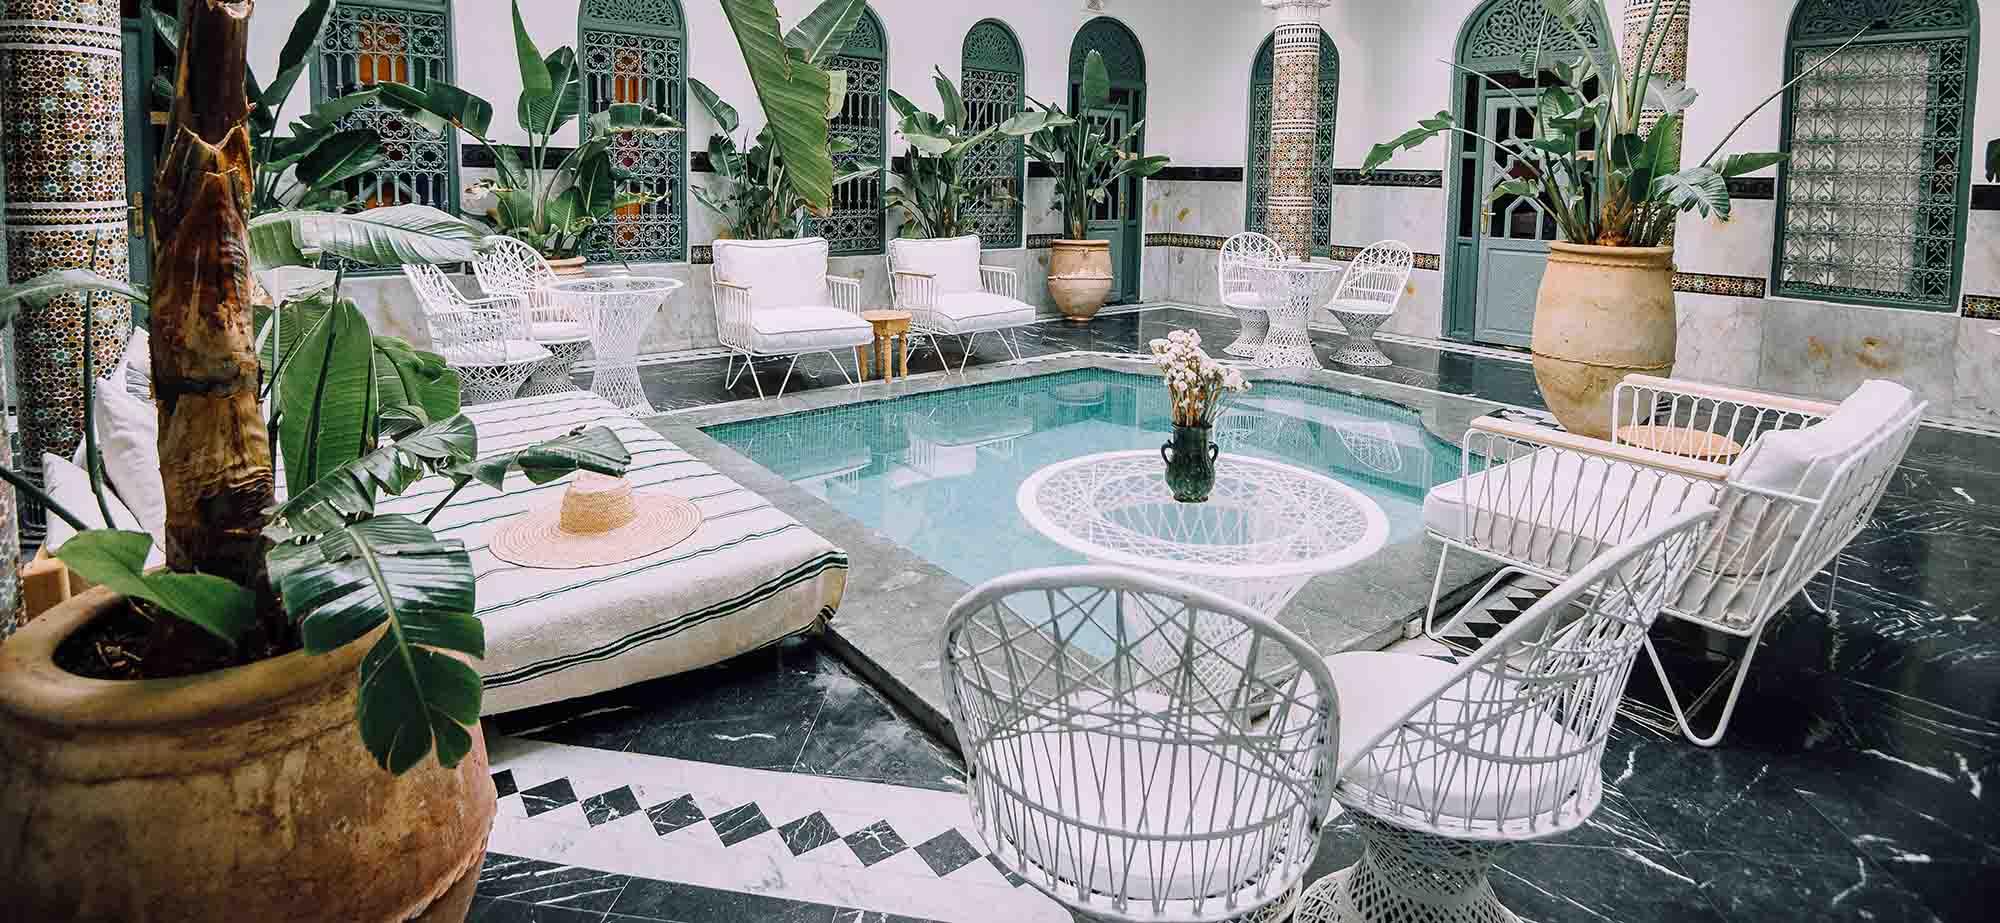 KSAR KASBAH & SPA MARRAKECH soleil piscine